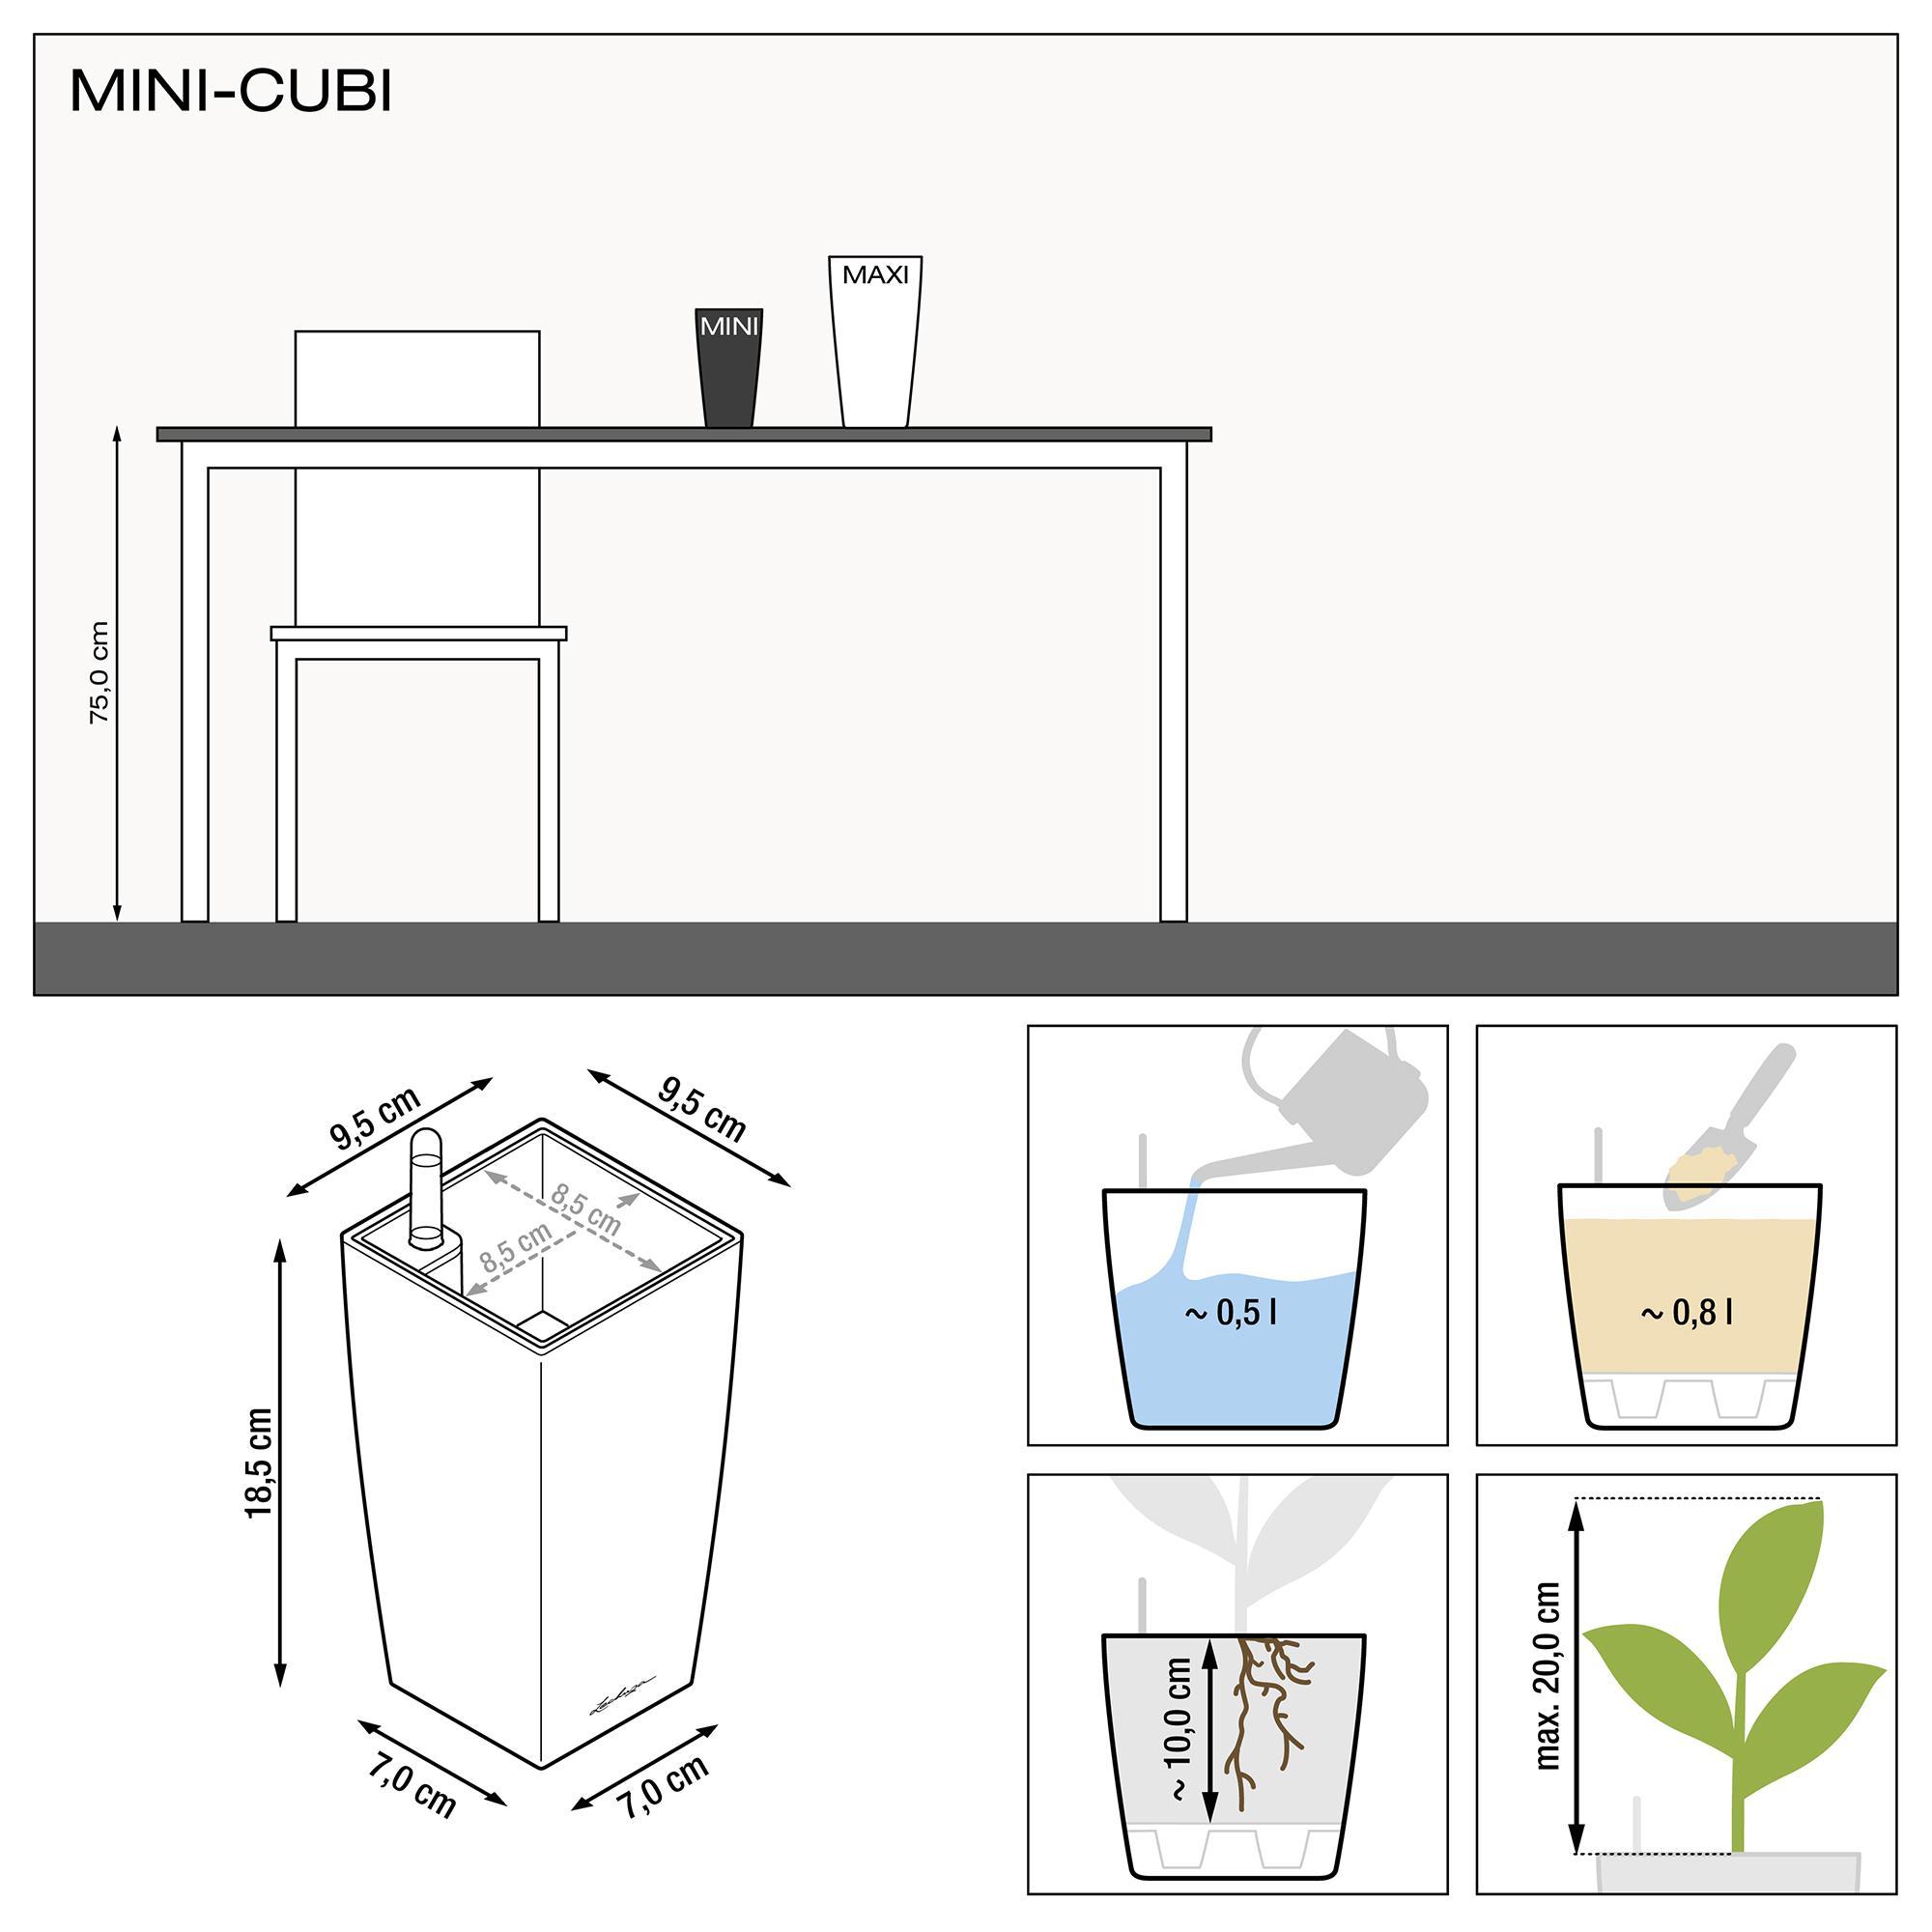 MINI-CUBI pastellviolett hochglanz - Bild 3